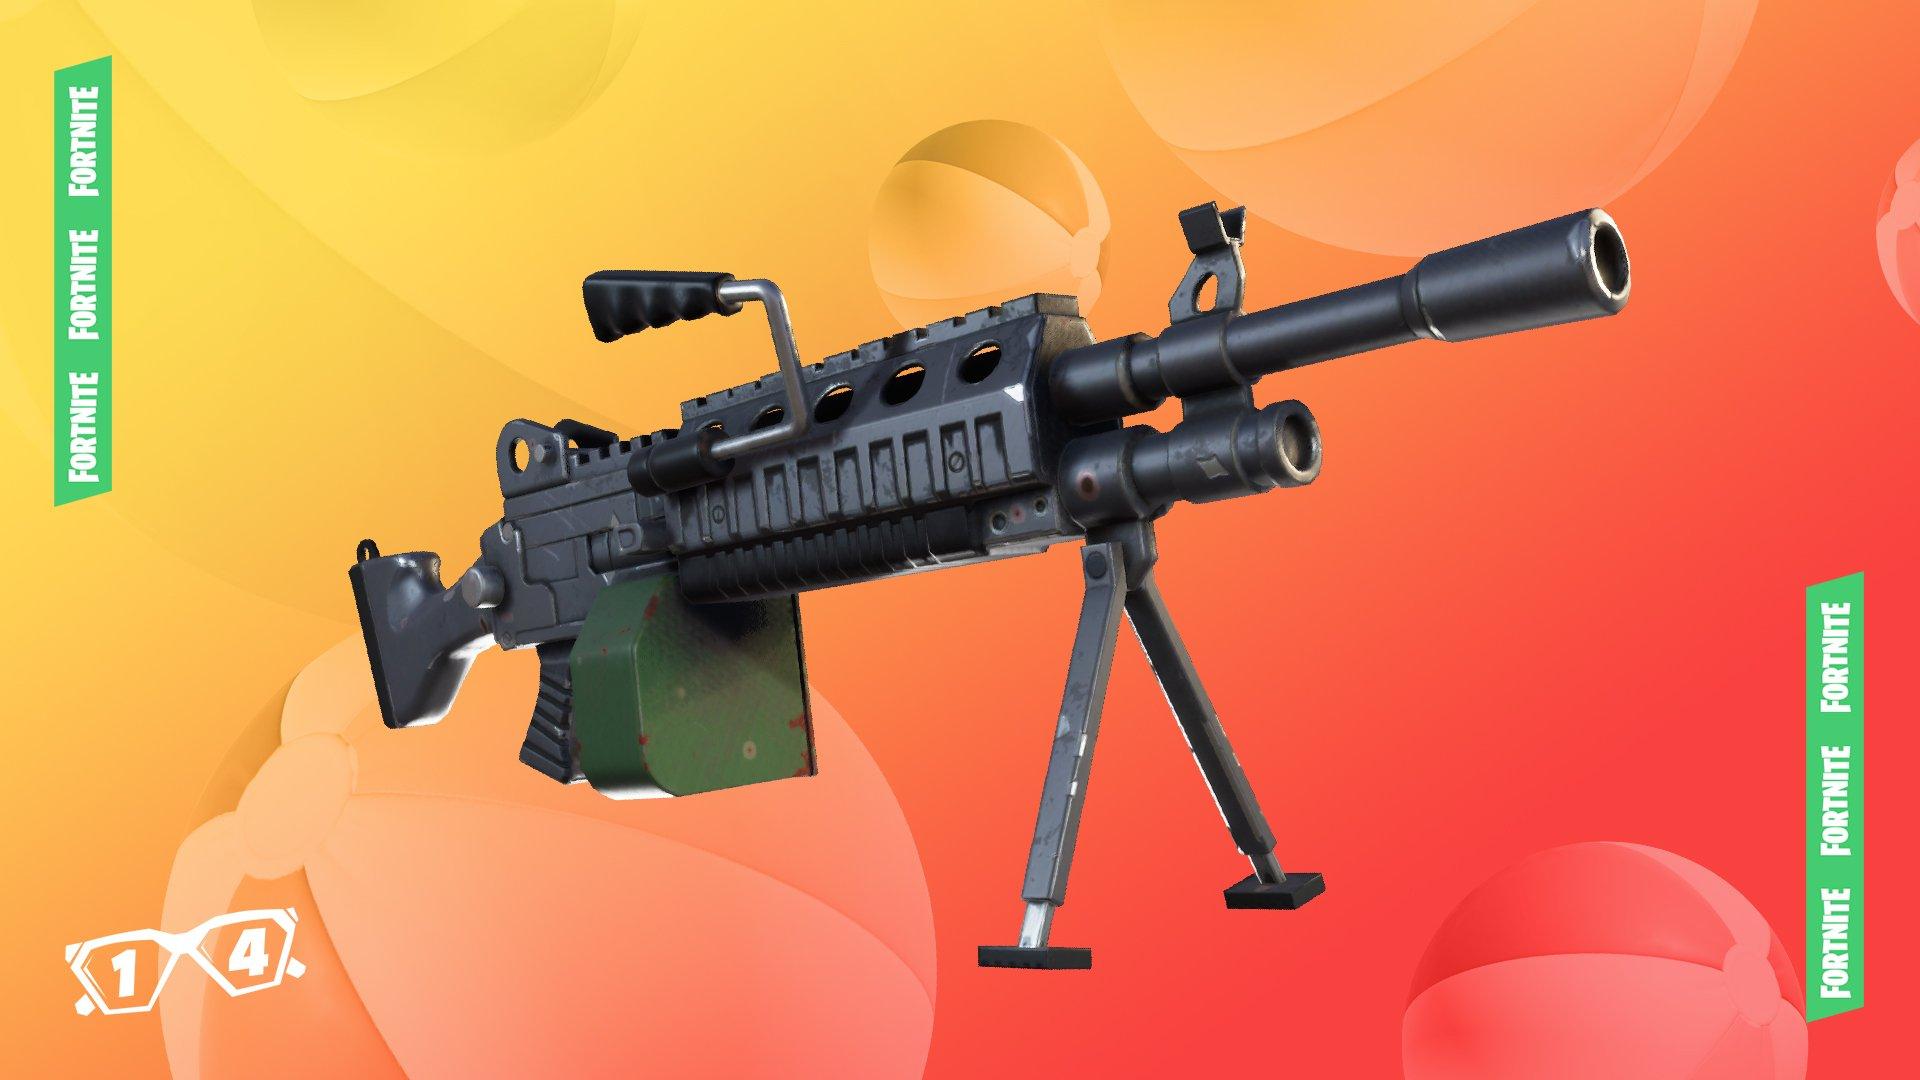 14 Days of Summer Fortnite Event Day 1 Light Machine Gun Not Desired